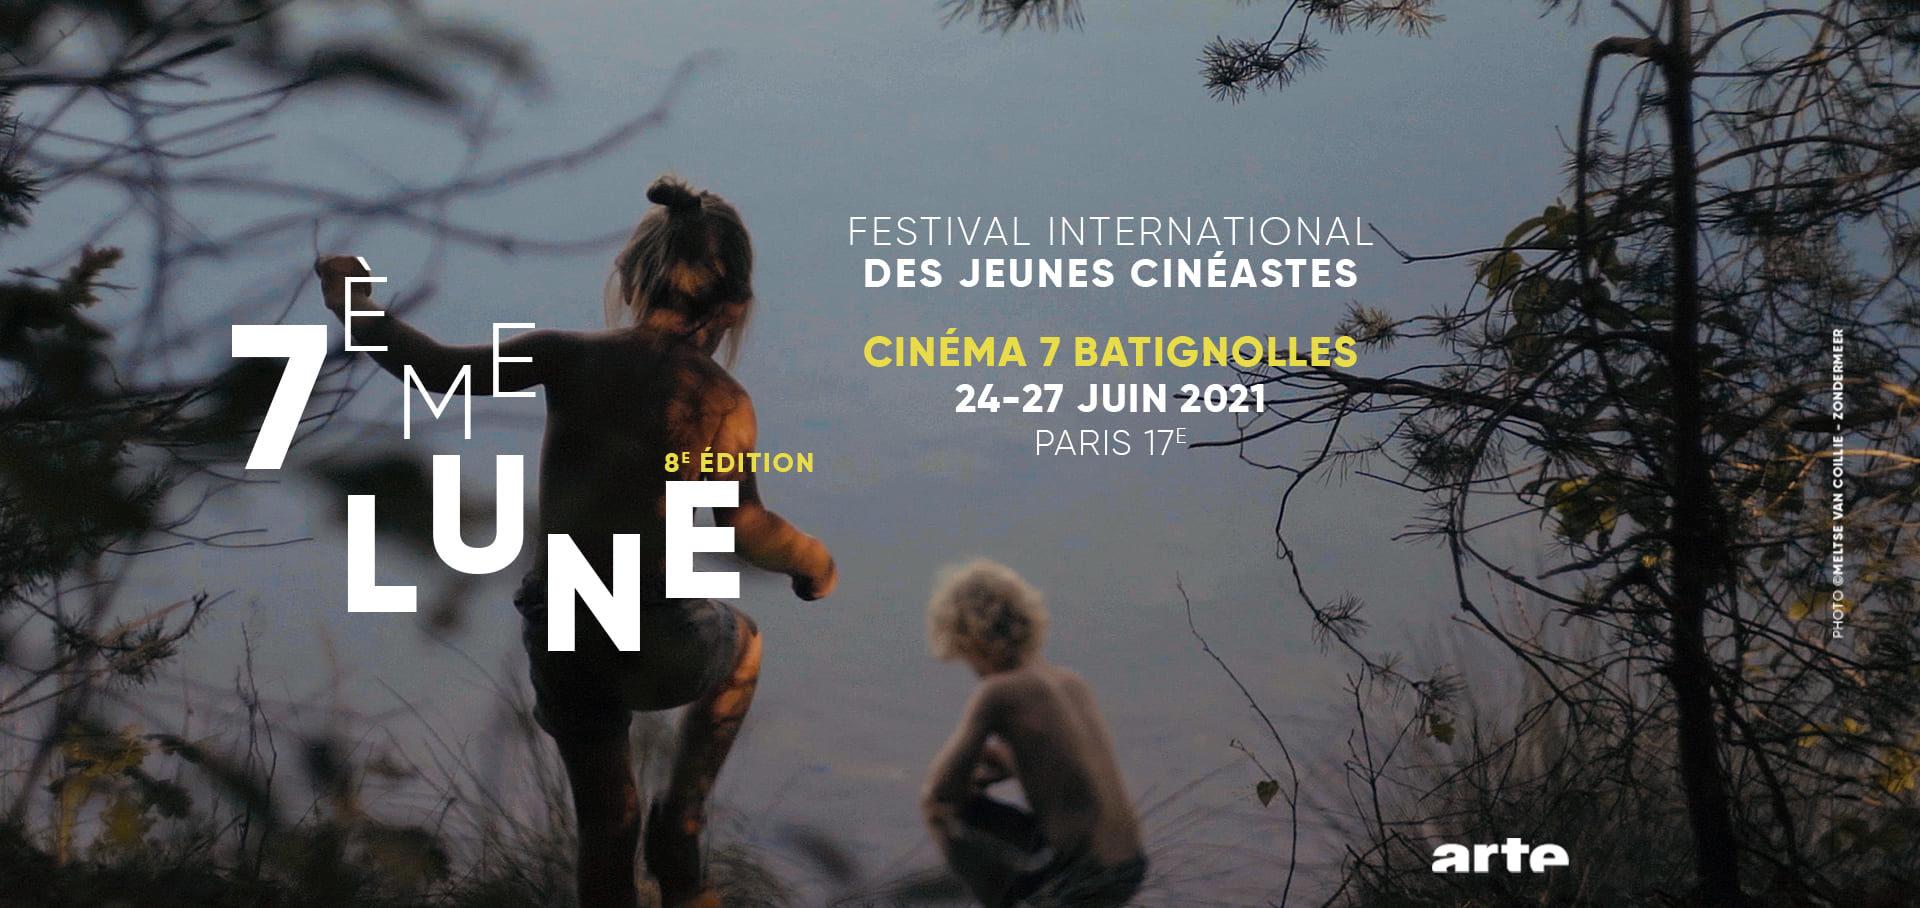 7ème Lune - Festival international du film